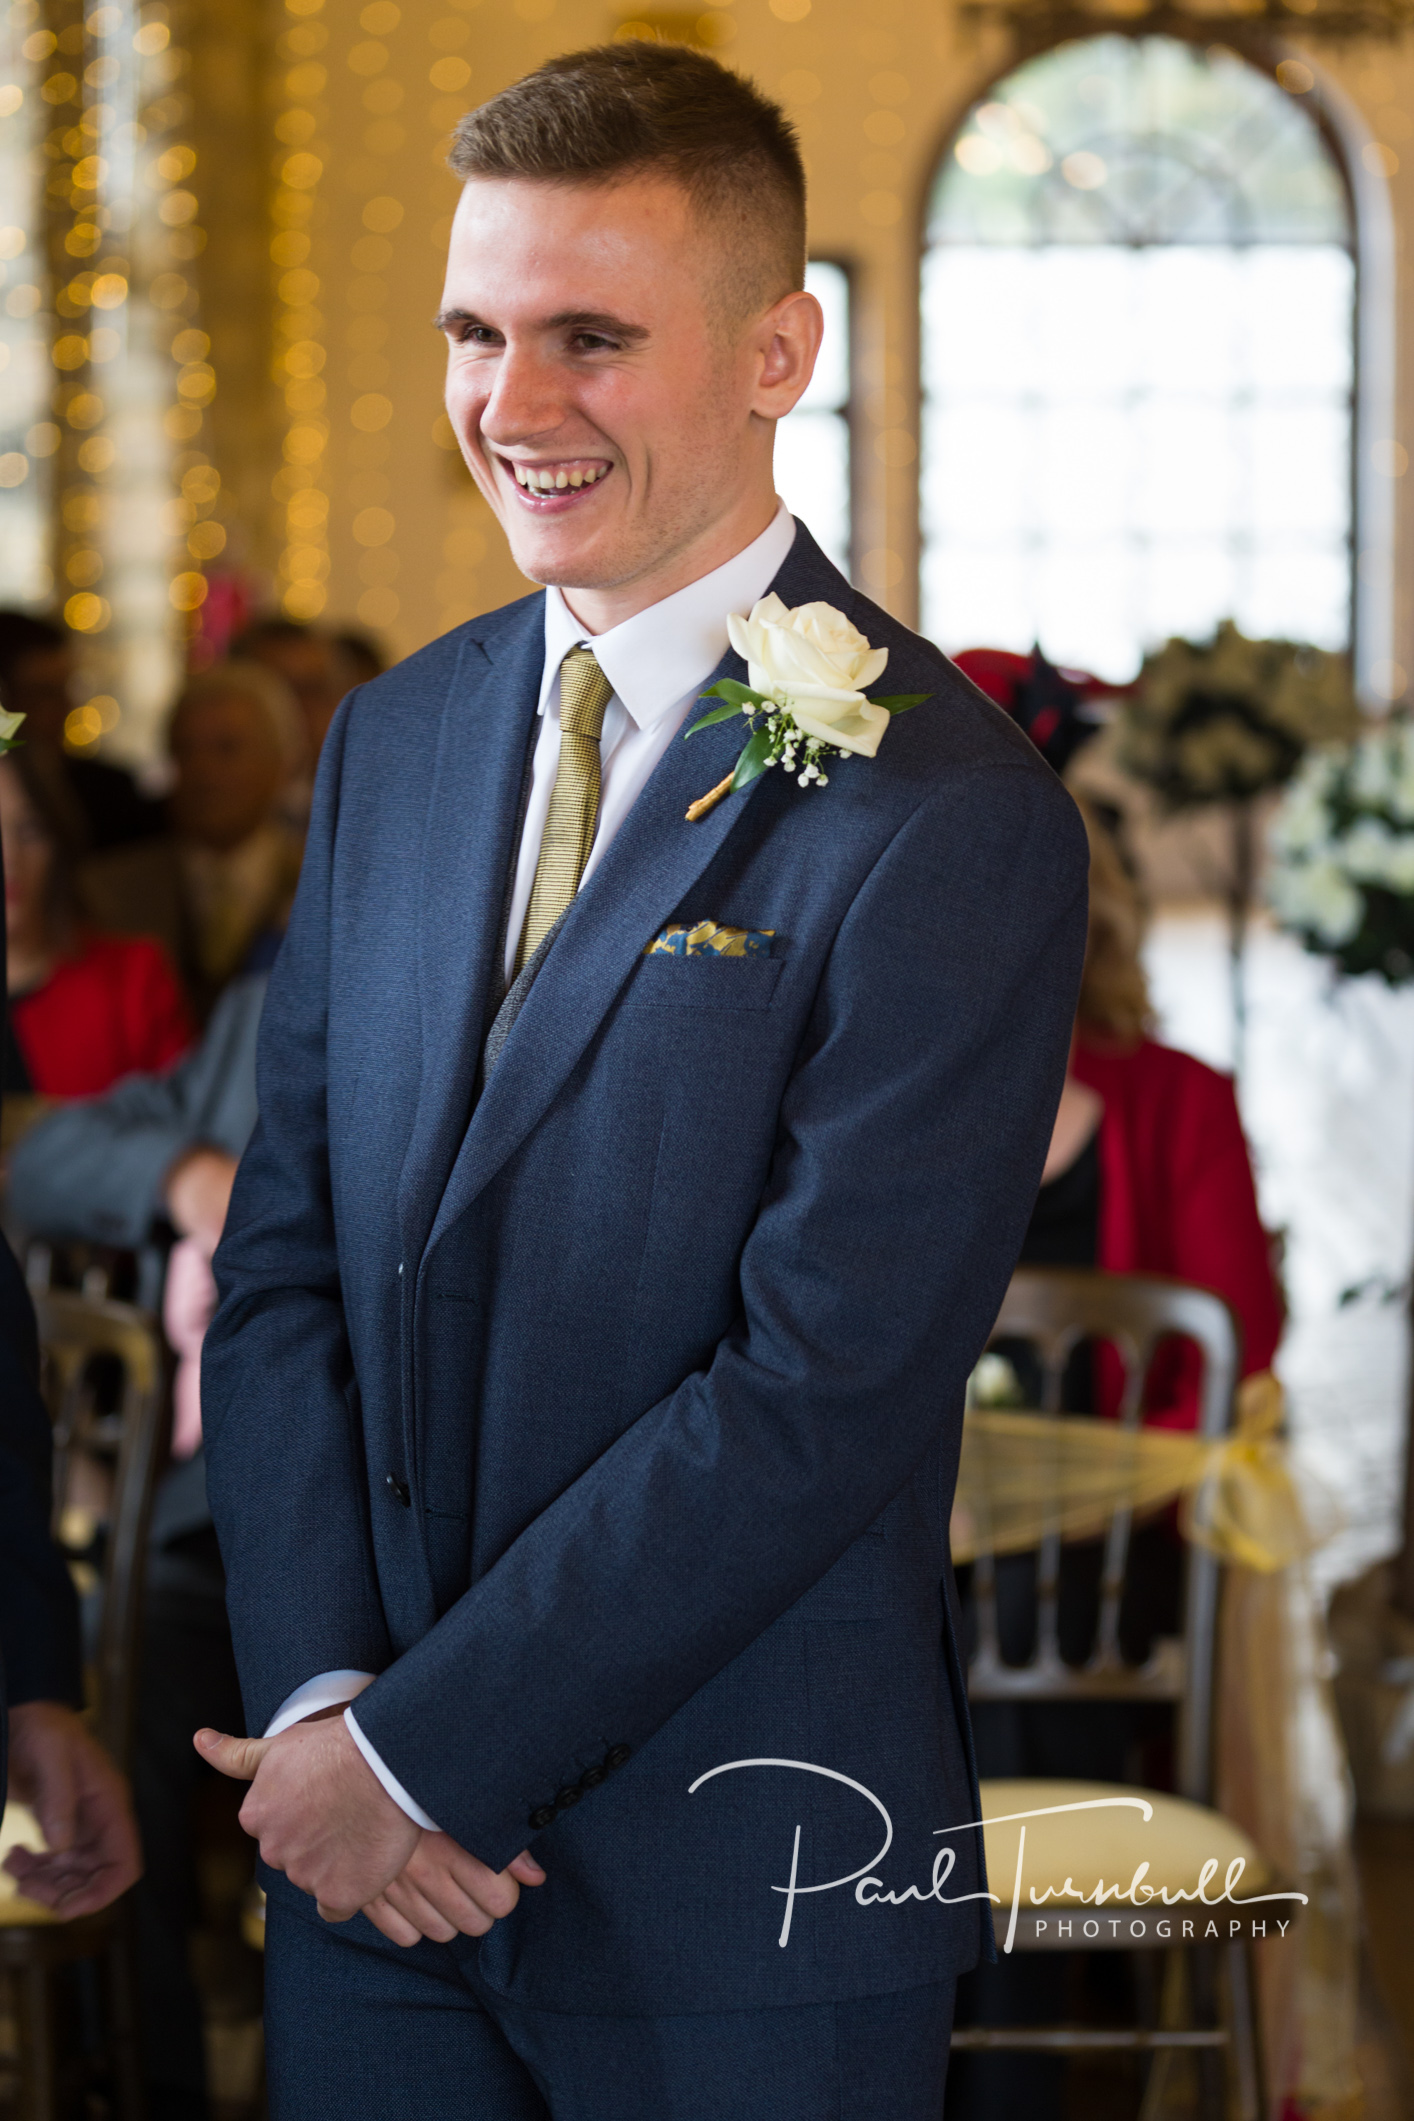 wedding-photographer-raven-hall-ravenscroft--scarborough-yorkshire-lucy-ryan-023.jpg